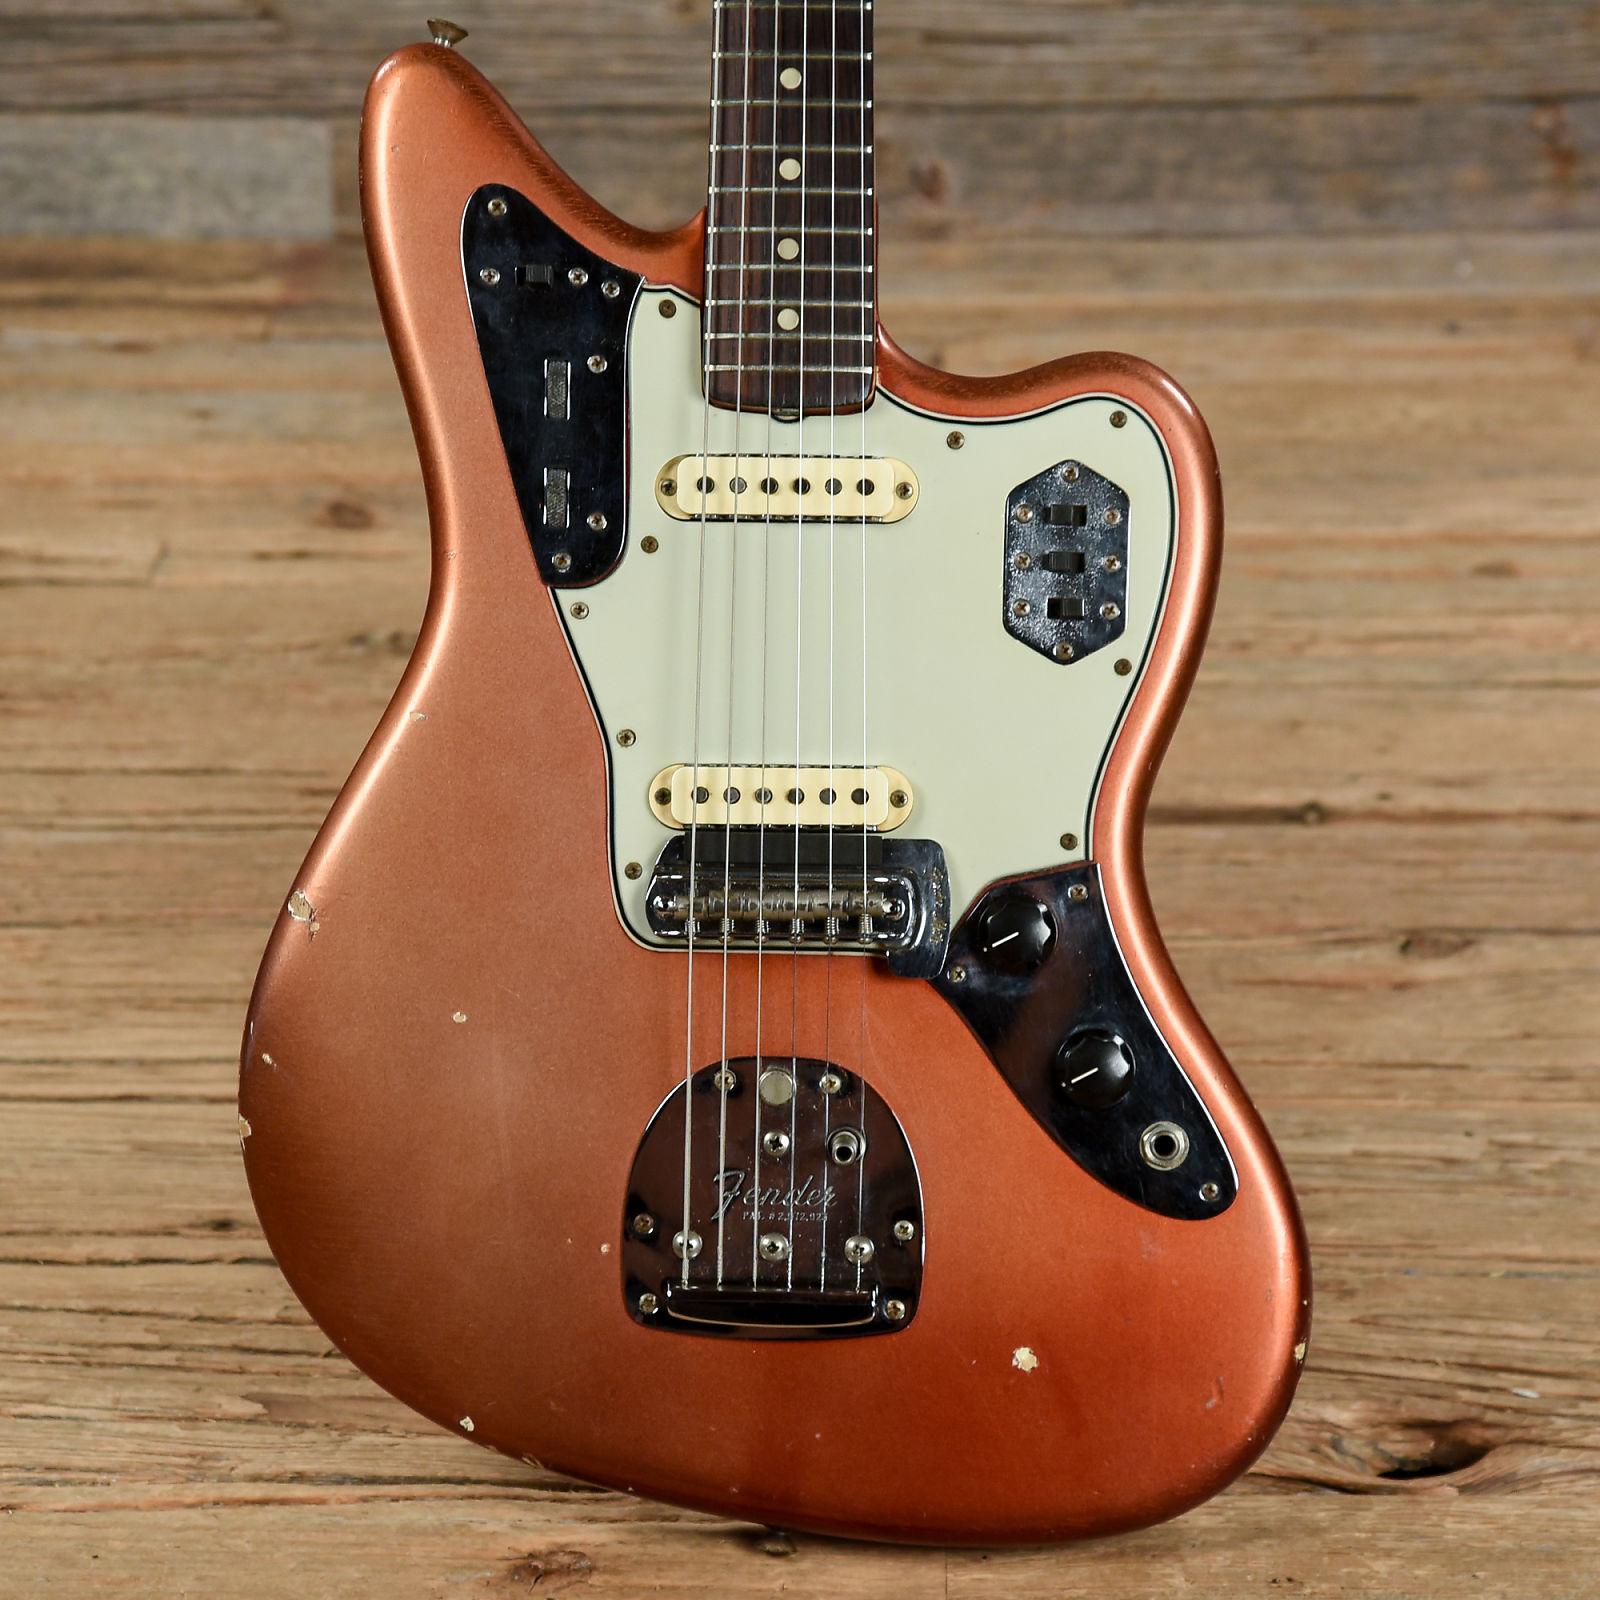 w cbs guitar lake placid original pre listing electric offset ohc wohc fender blue jaguar